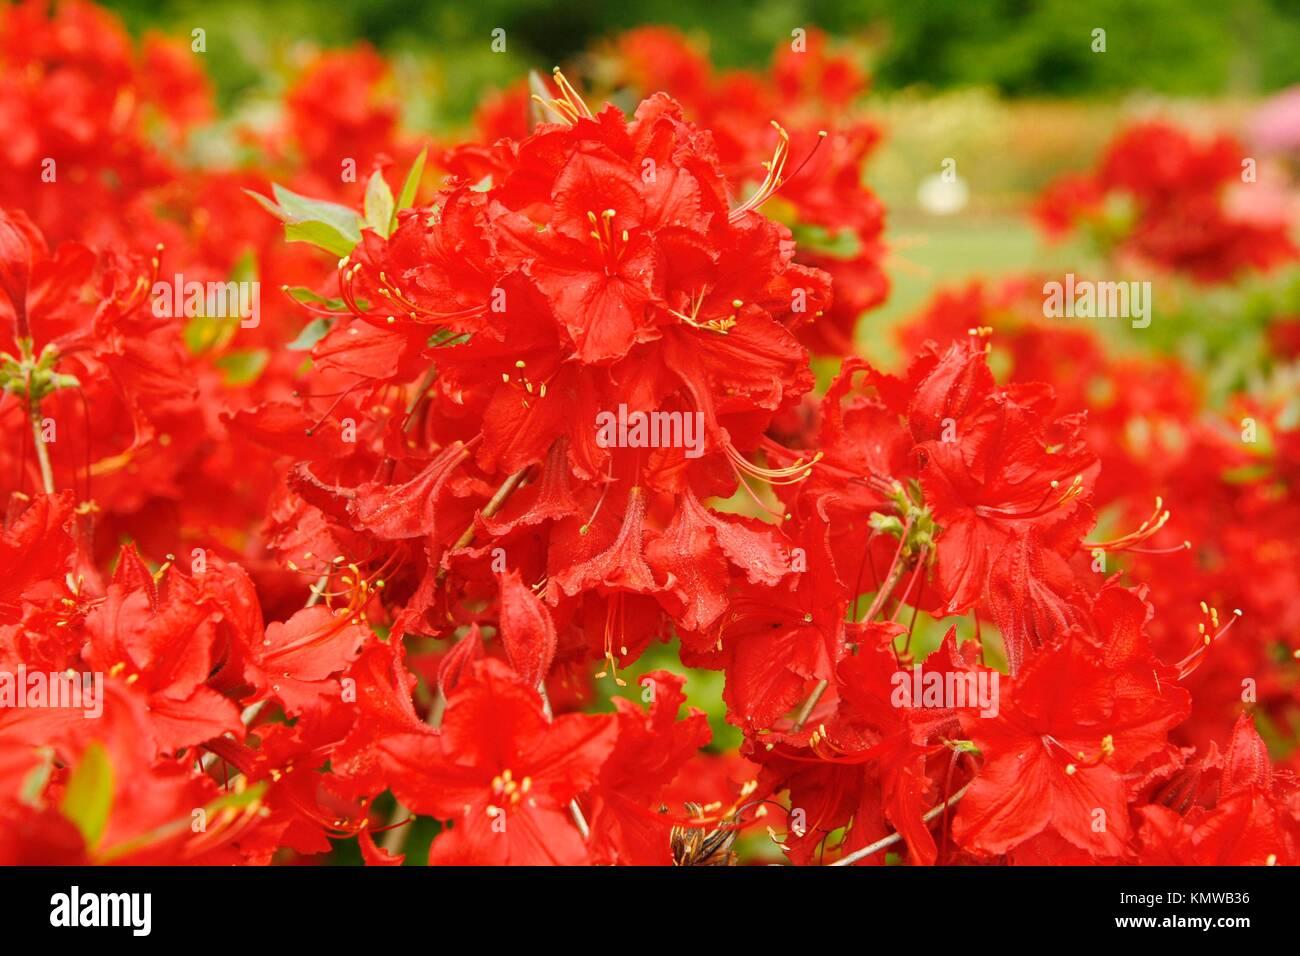 Royal Botanic Gardens Kew in Richmond, London, England Azalea garden Rhododendron hybr ´Wallowa red´ - Stock Image